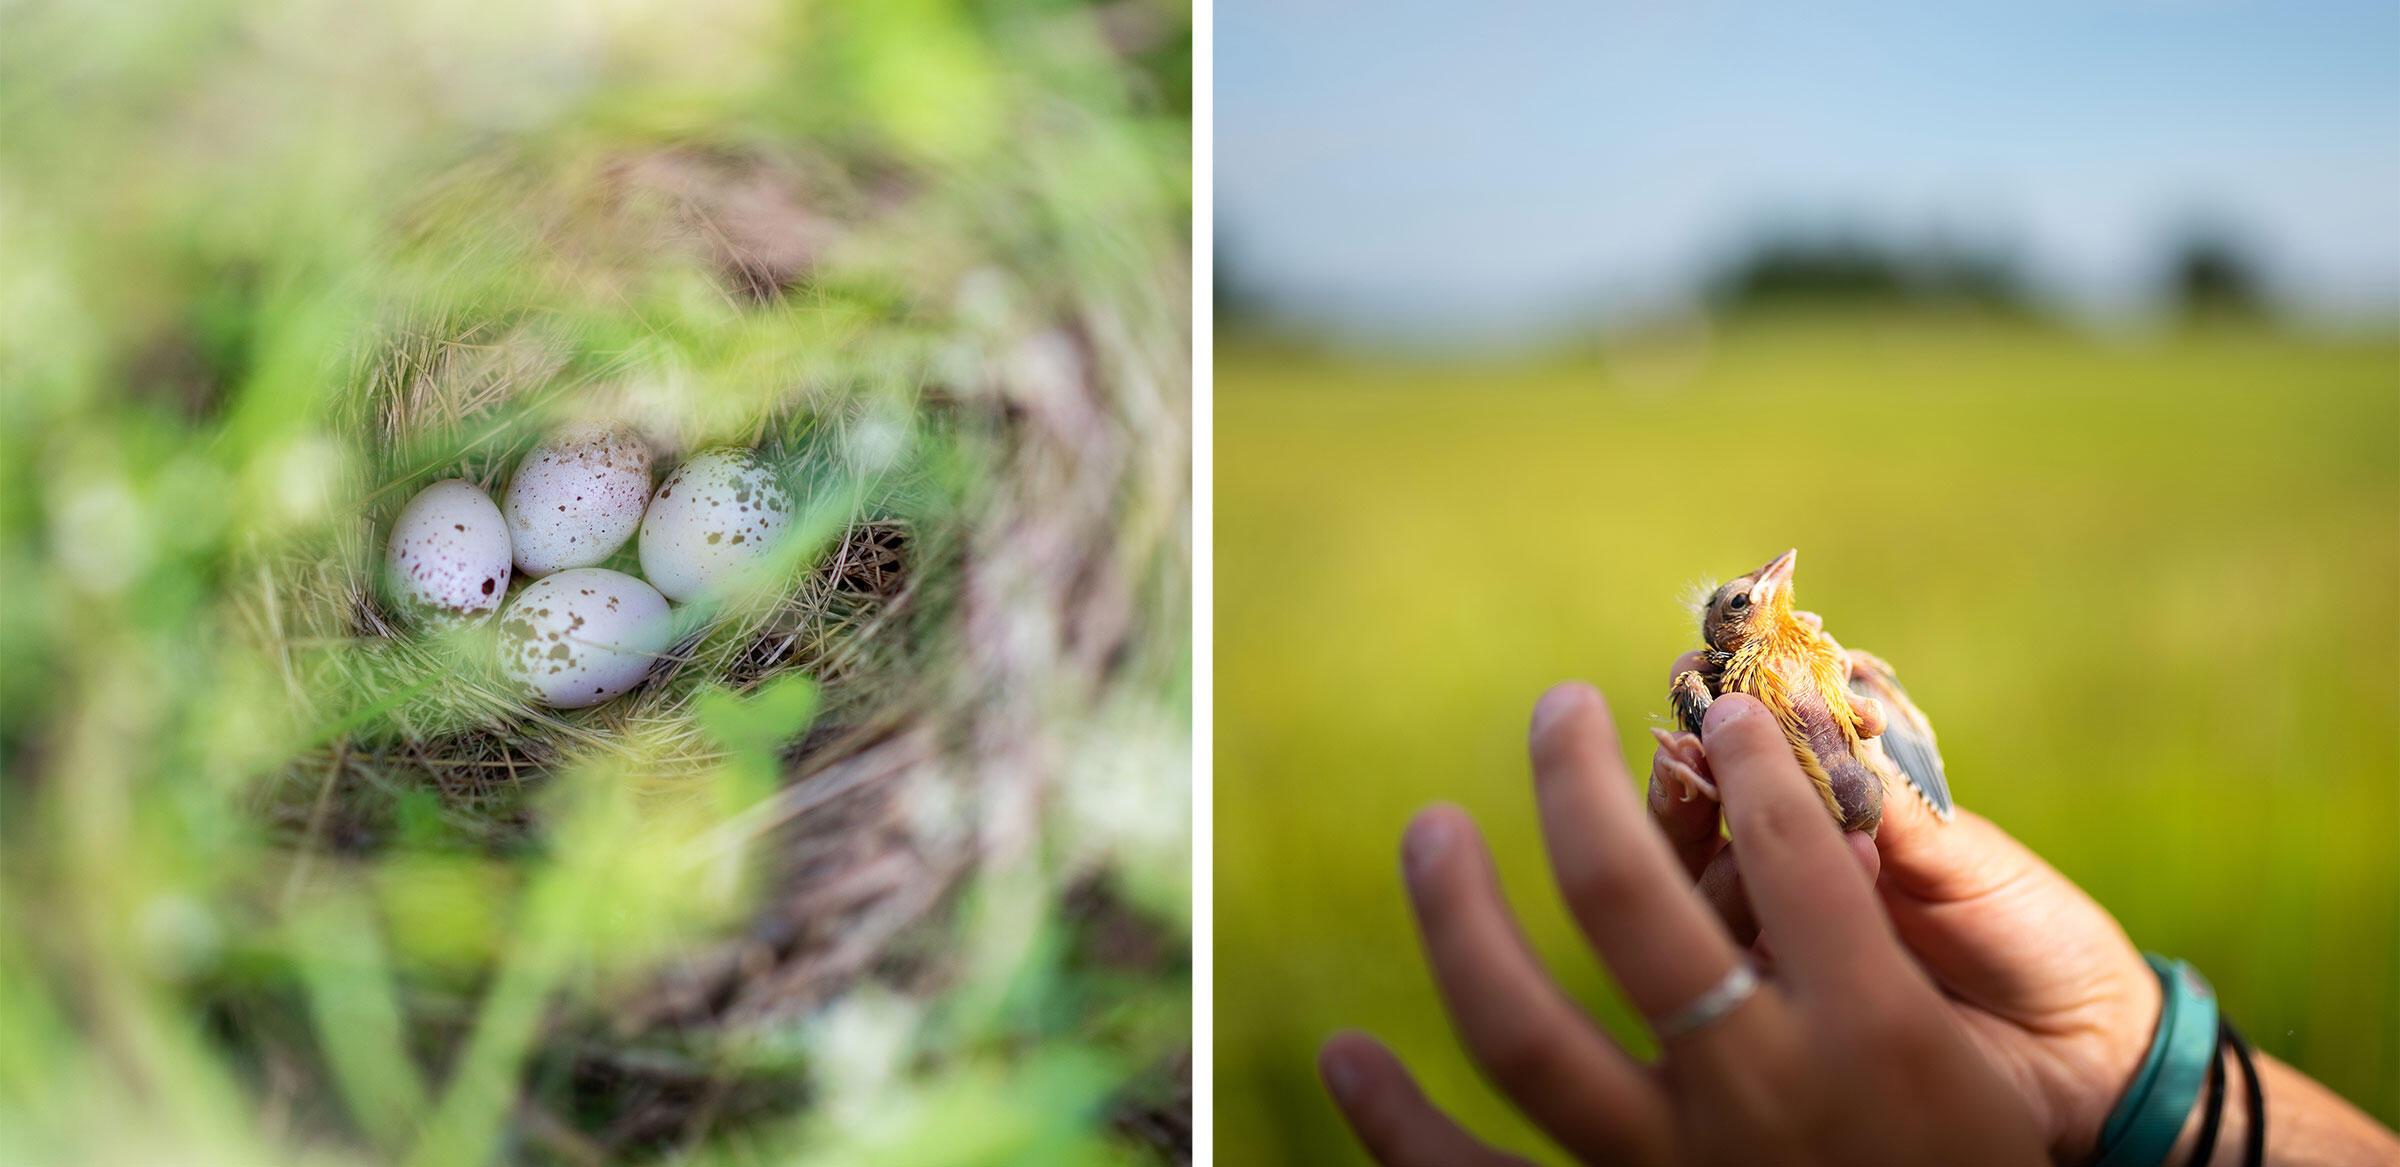 Noah Perlut's student holds up a Bobolink chick hatched on Shelburne Farms.